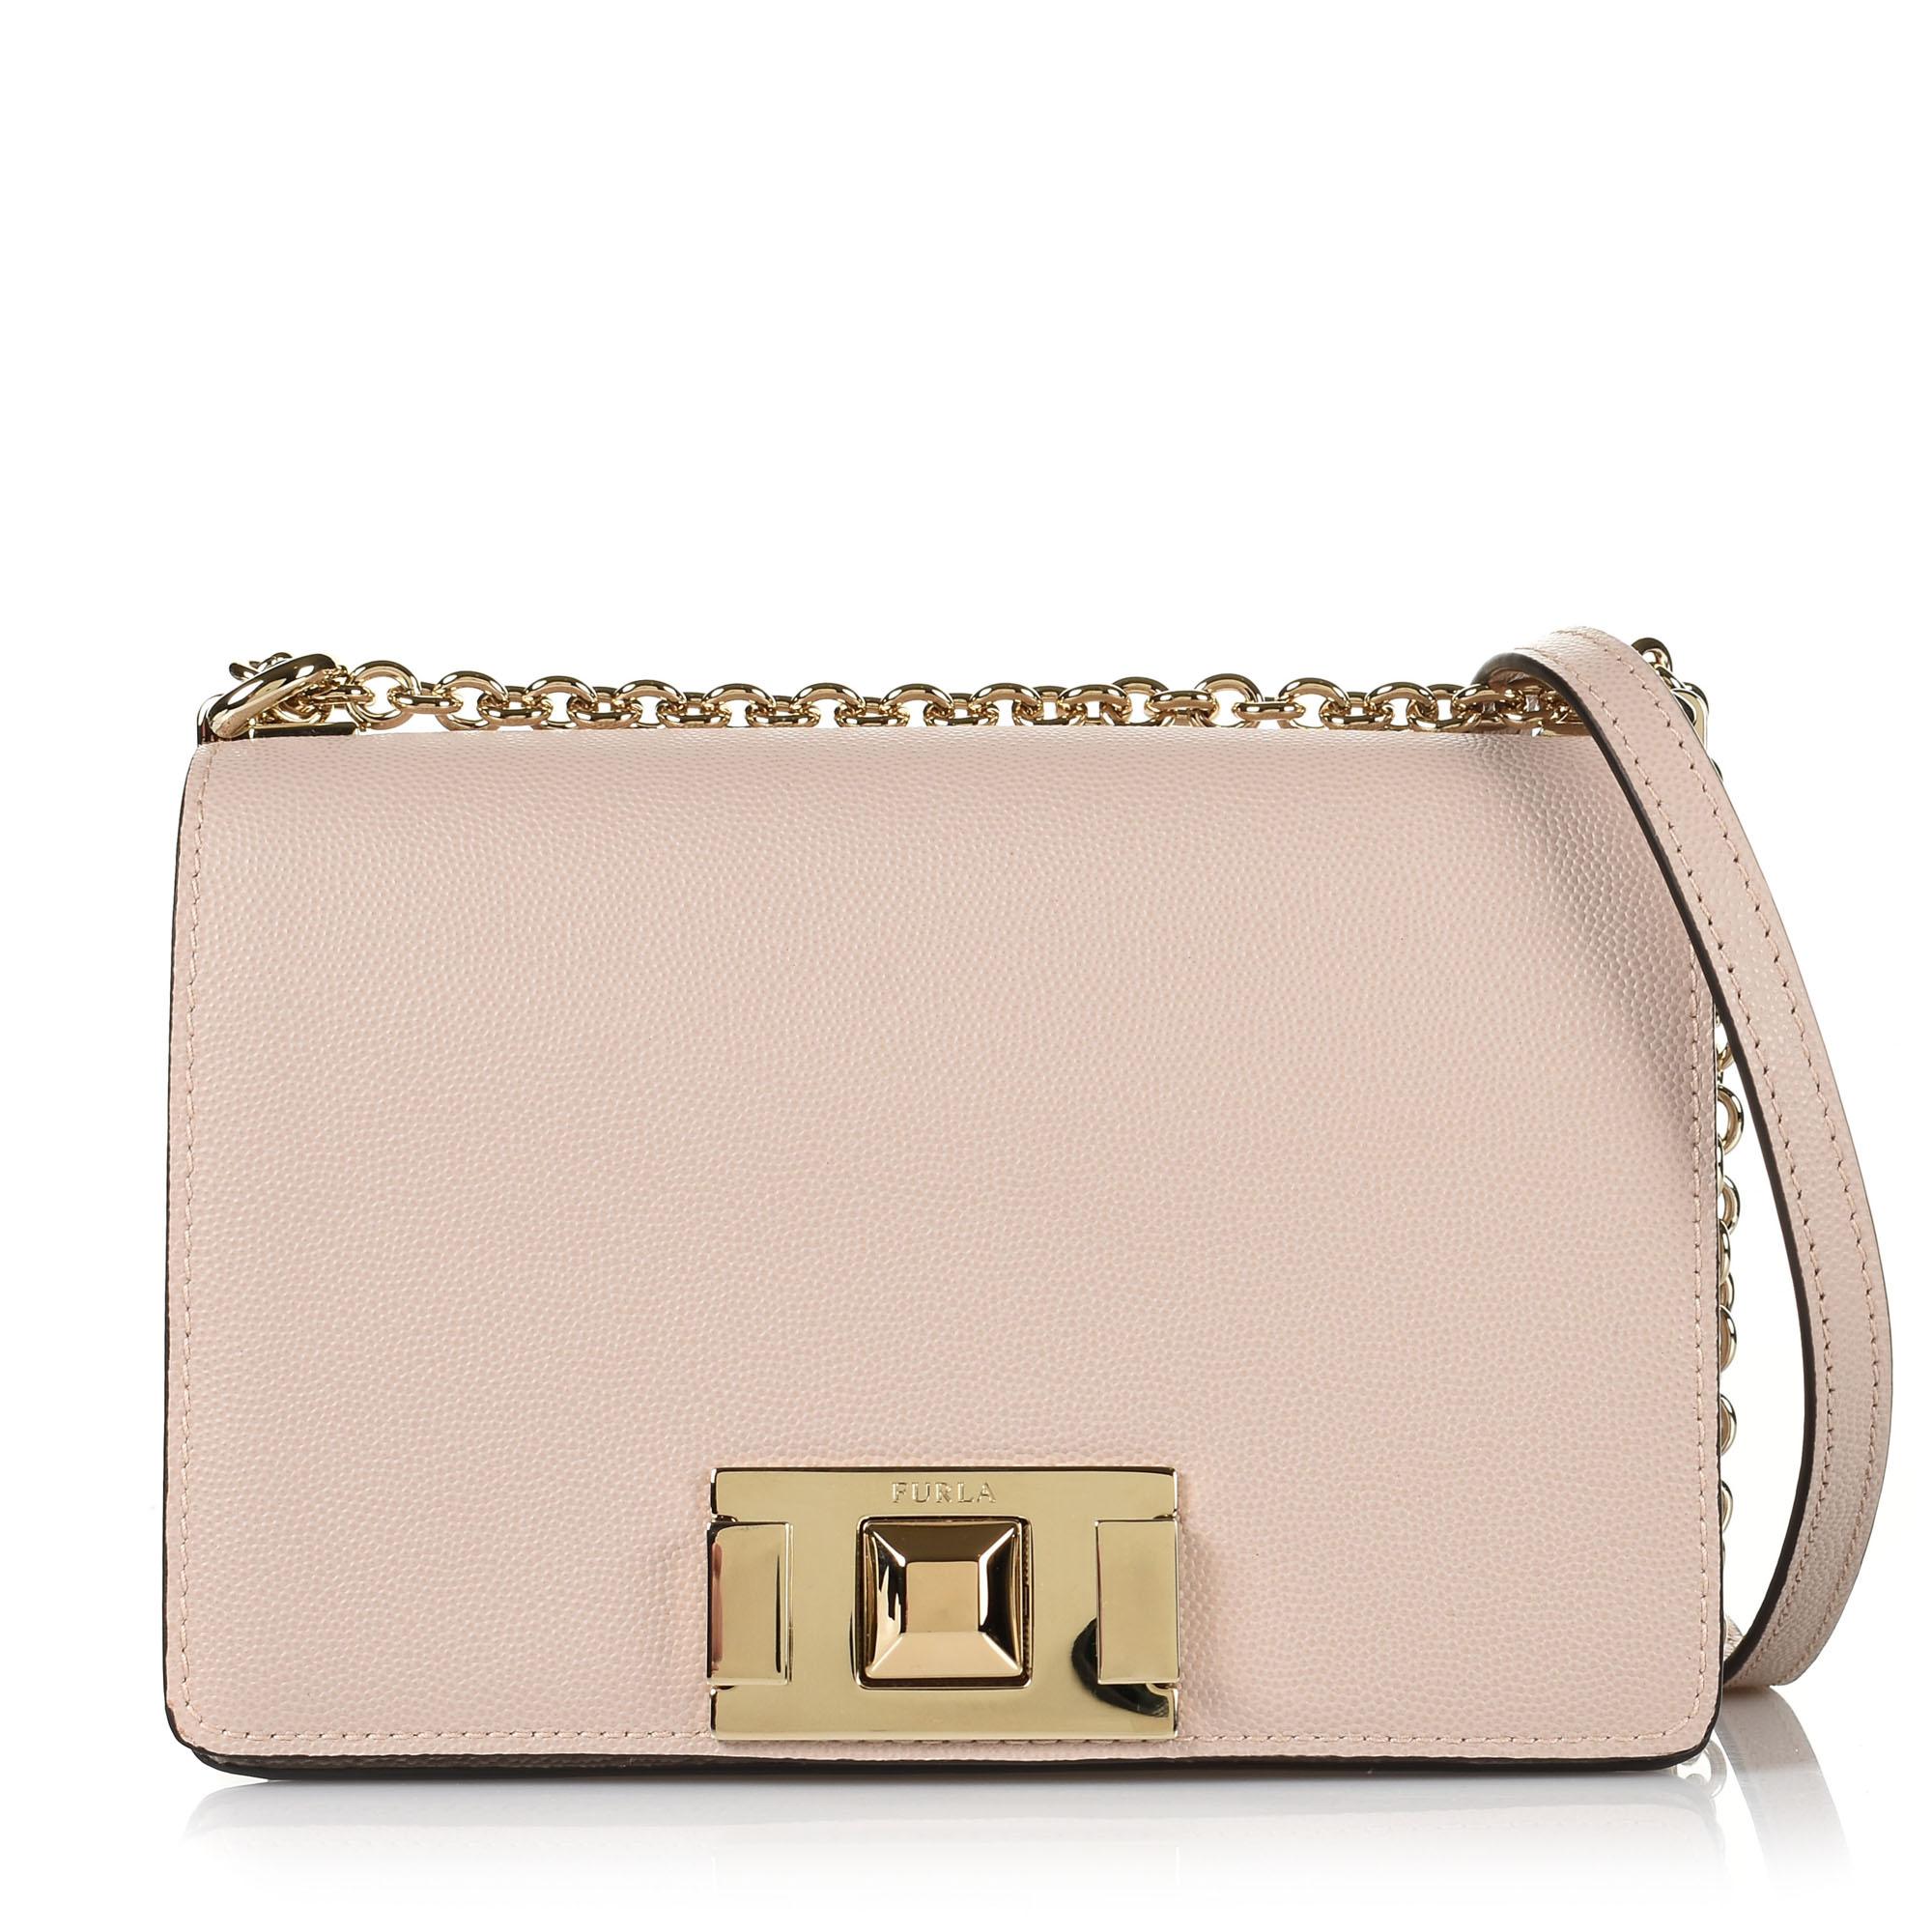 ff9033ccc0 Brand Bags Δερμάτινη Τσάντα Ώμου-Χιαστί Furla 010318